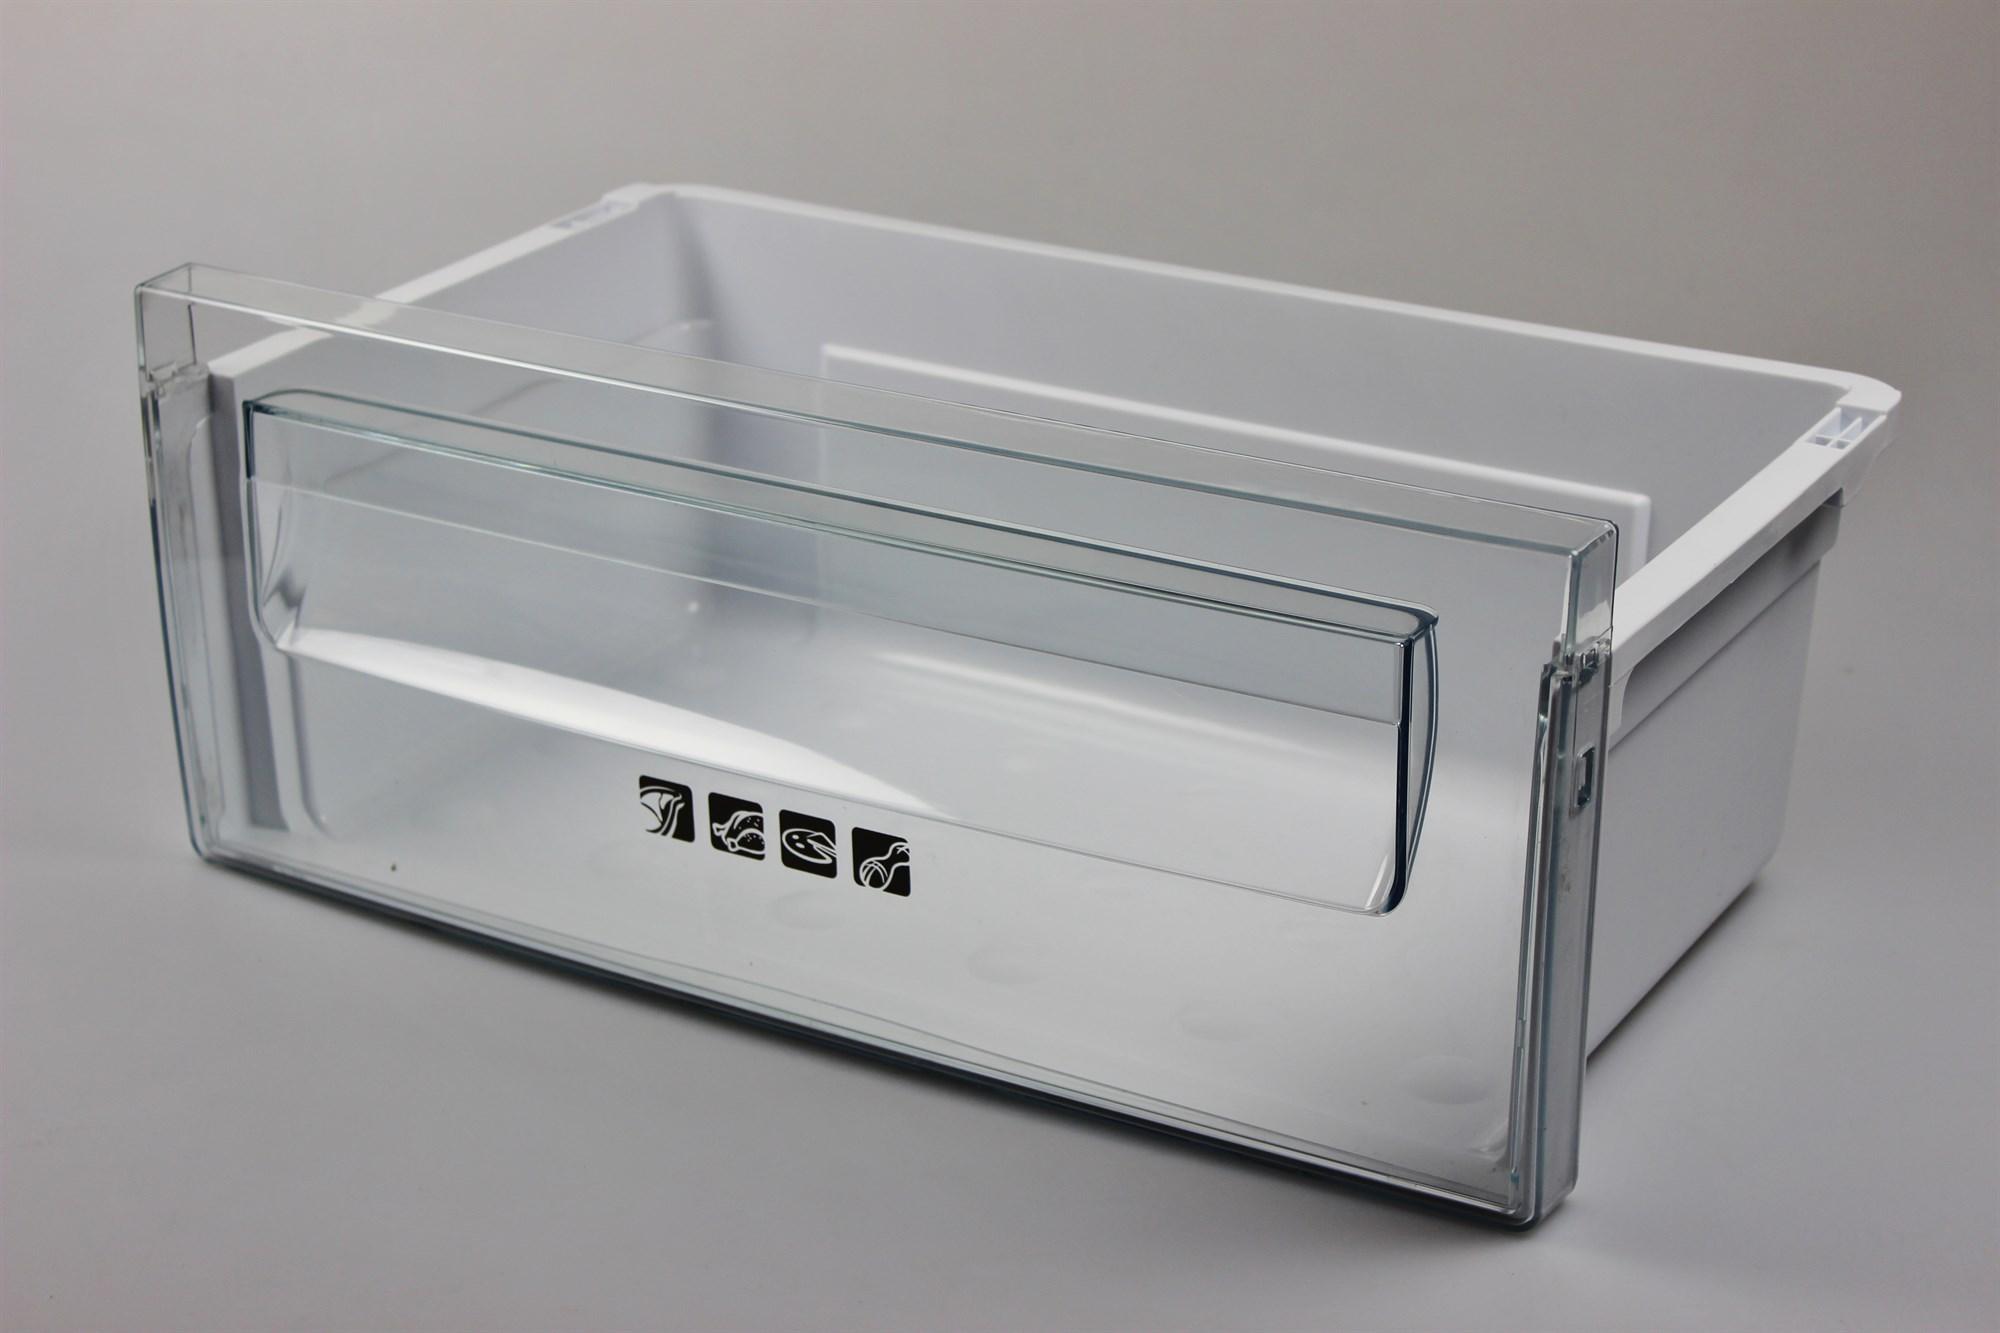 bac l gume samsung frigo cong lateur 190mm x 460mm x 270mm. Black Bedroom Furniture Sets. Home Design Ideas